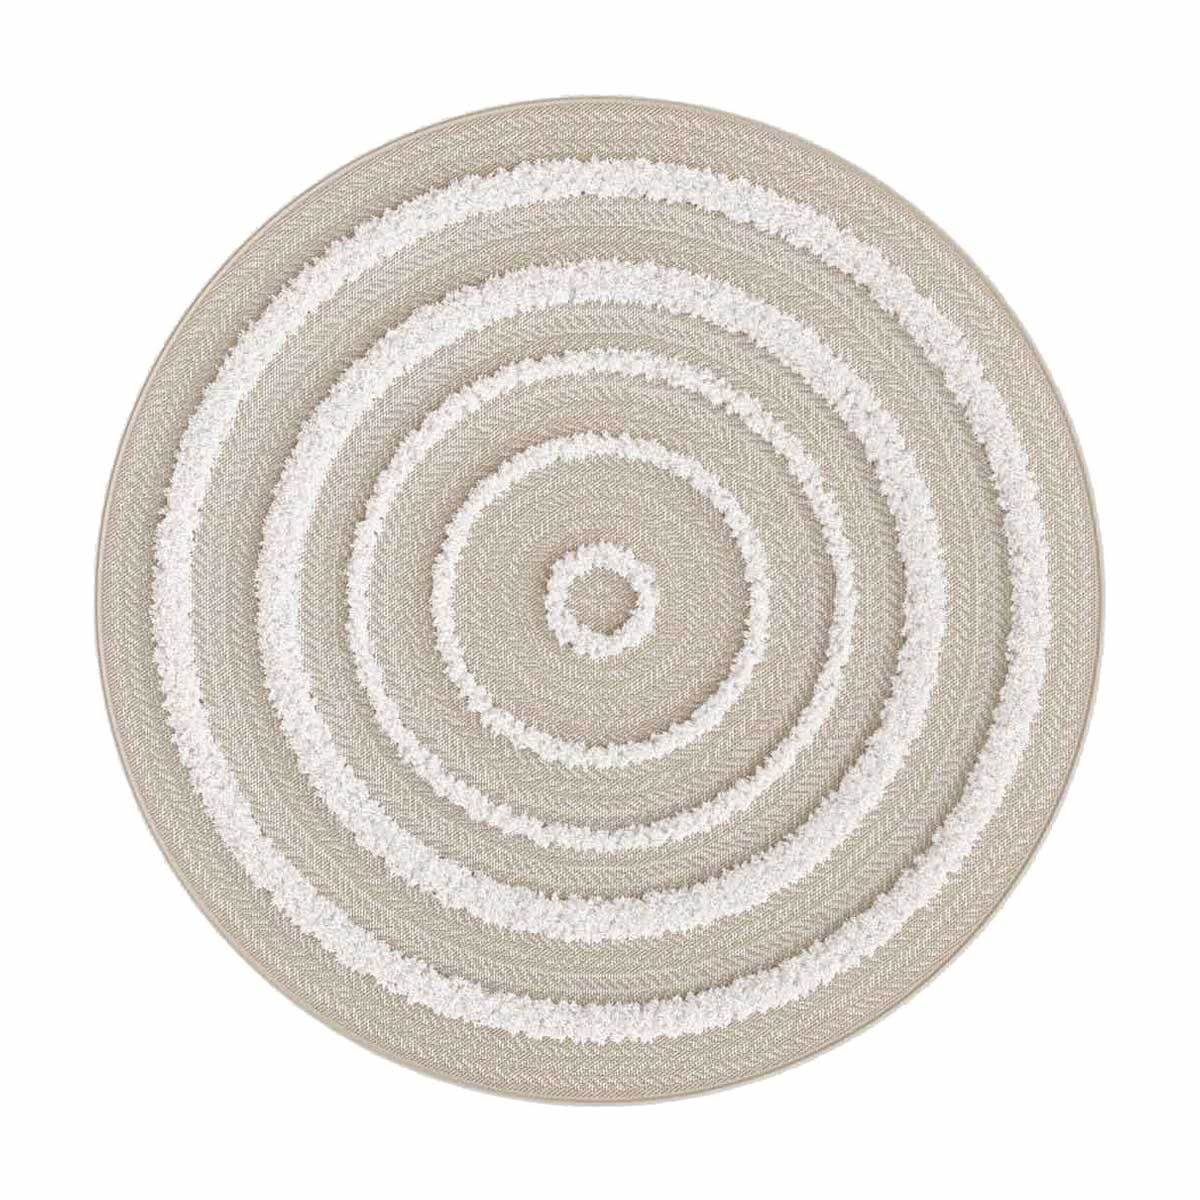 tapis rond relief ecru dashan 120 cm